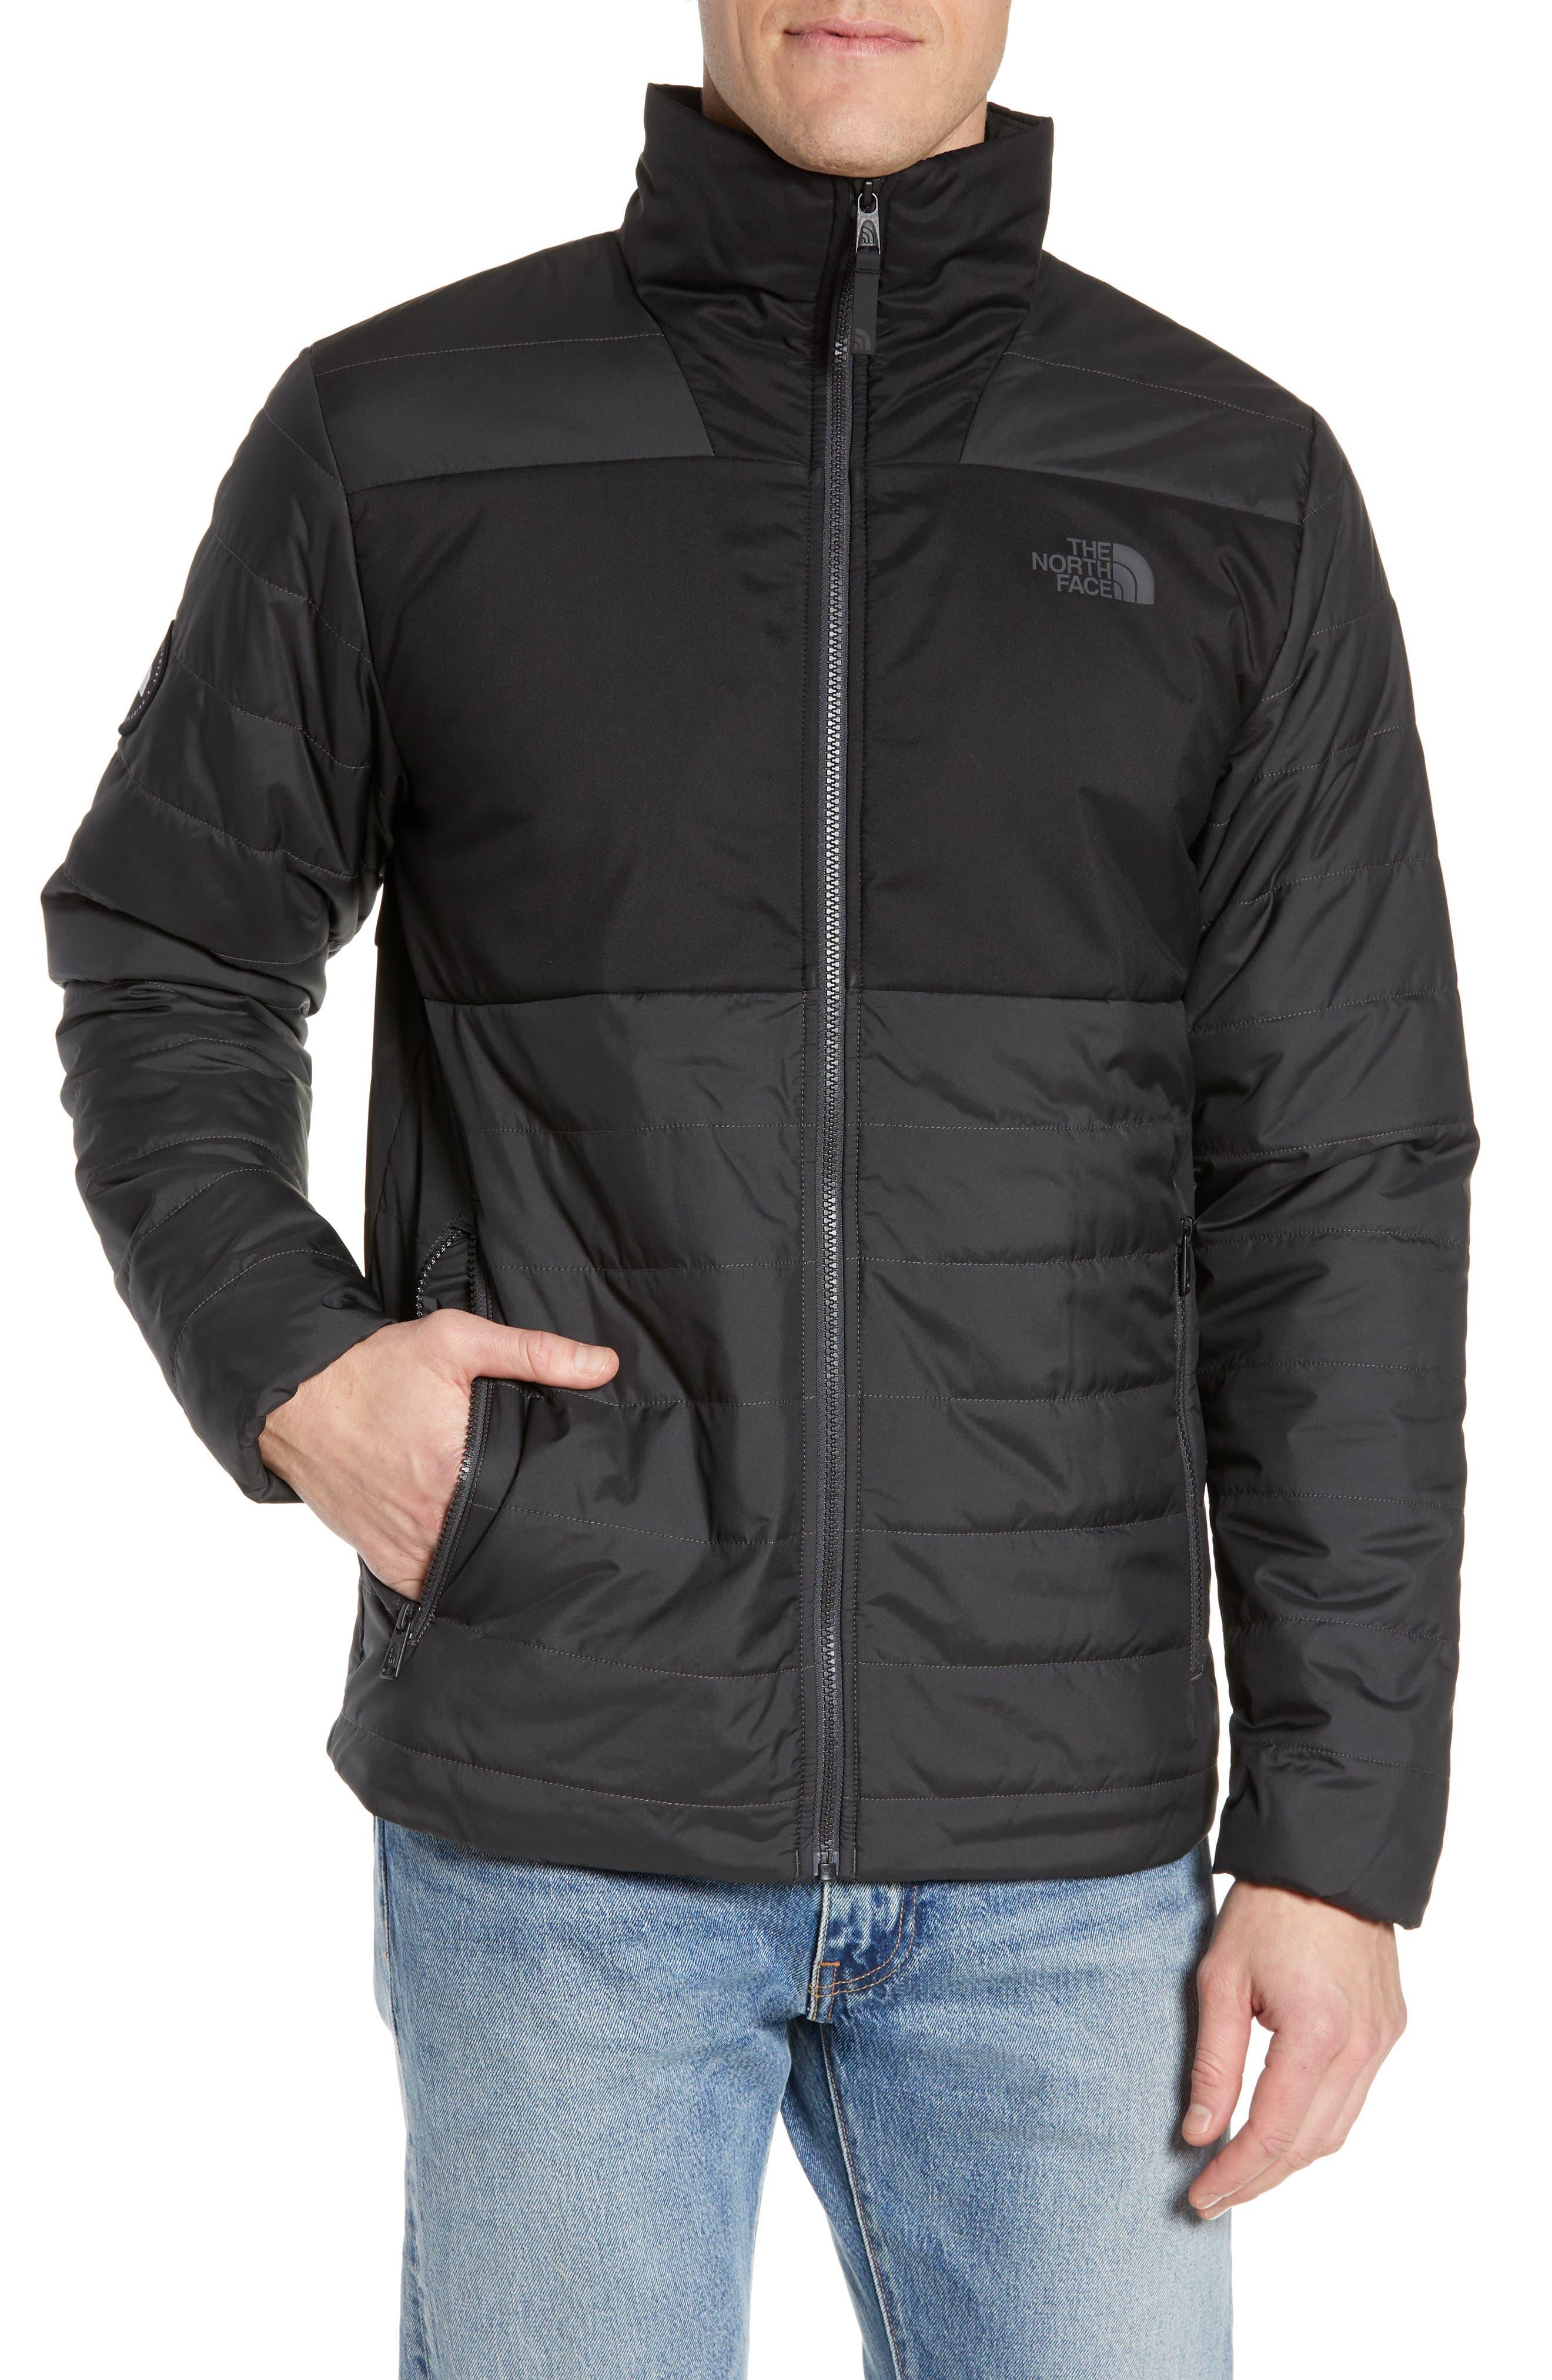 THE NORTH FACE, Insulated Jacket, Alternate thumbnail 5, color, TNF BLACK/ ASPHALT GREY